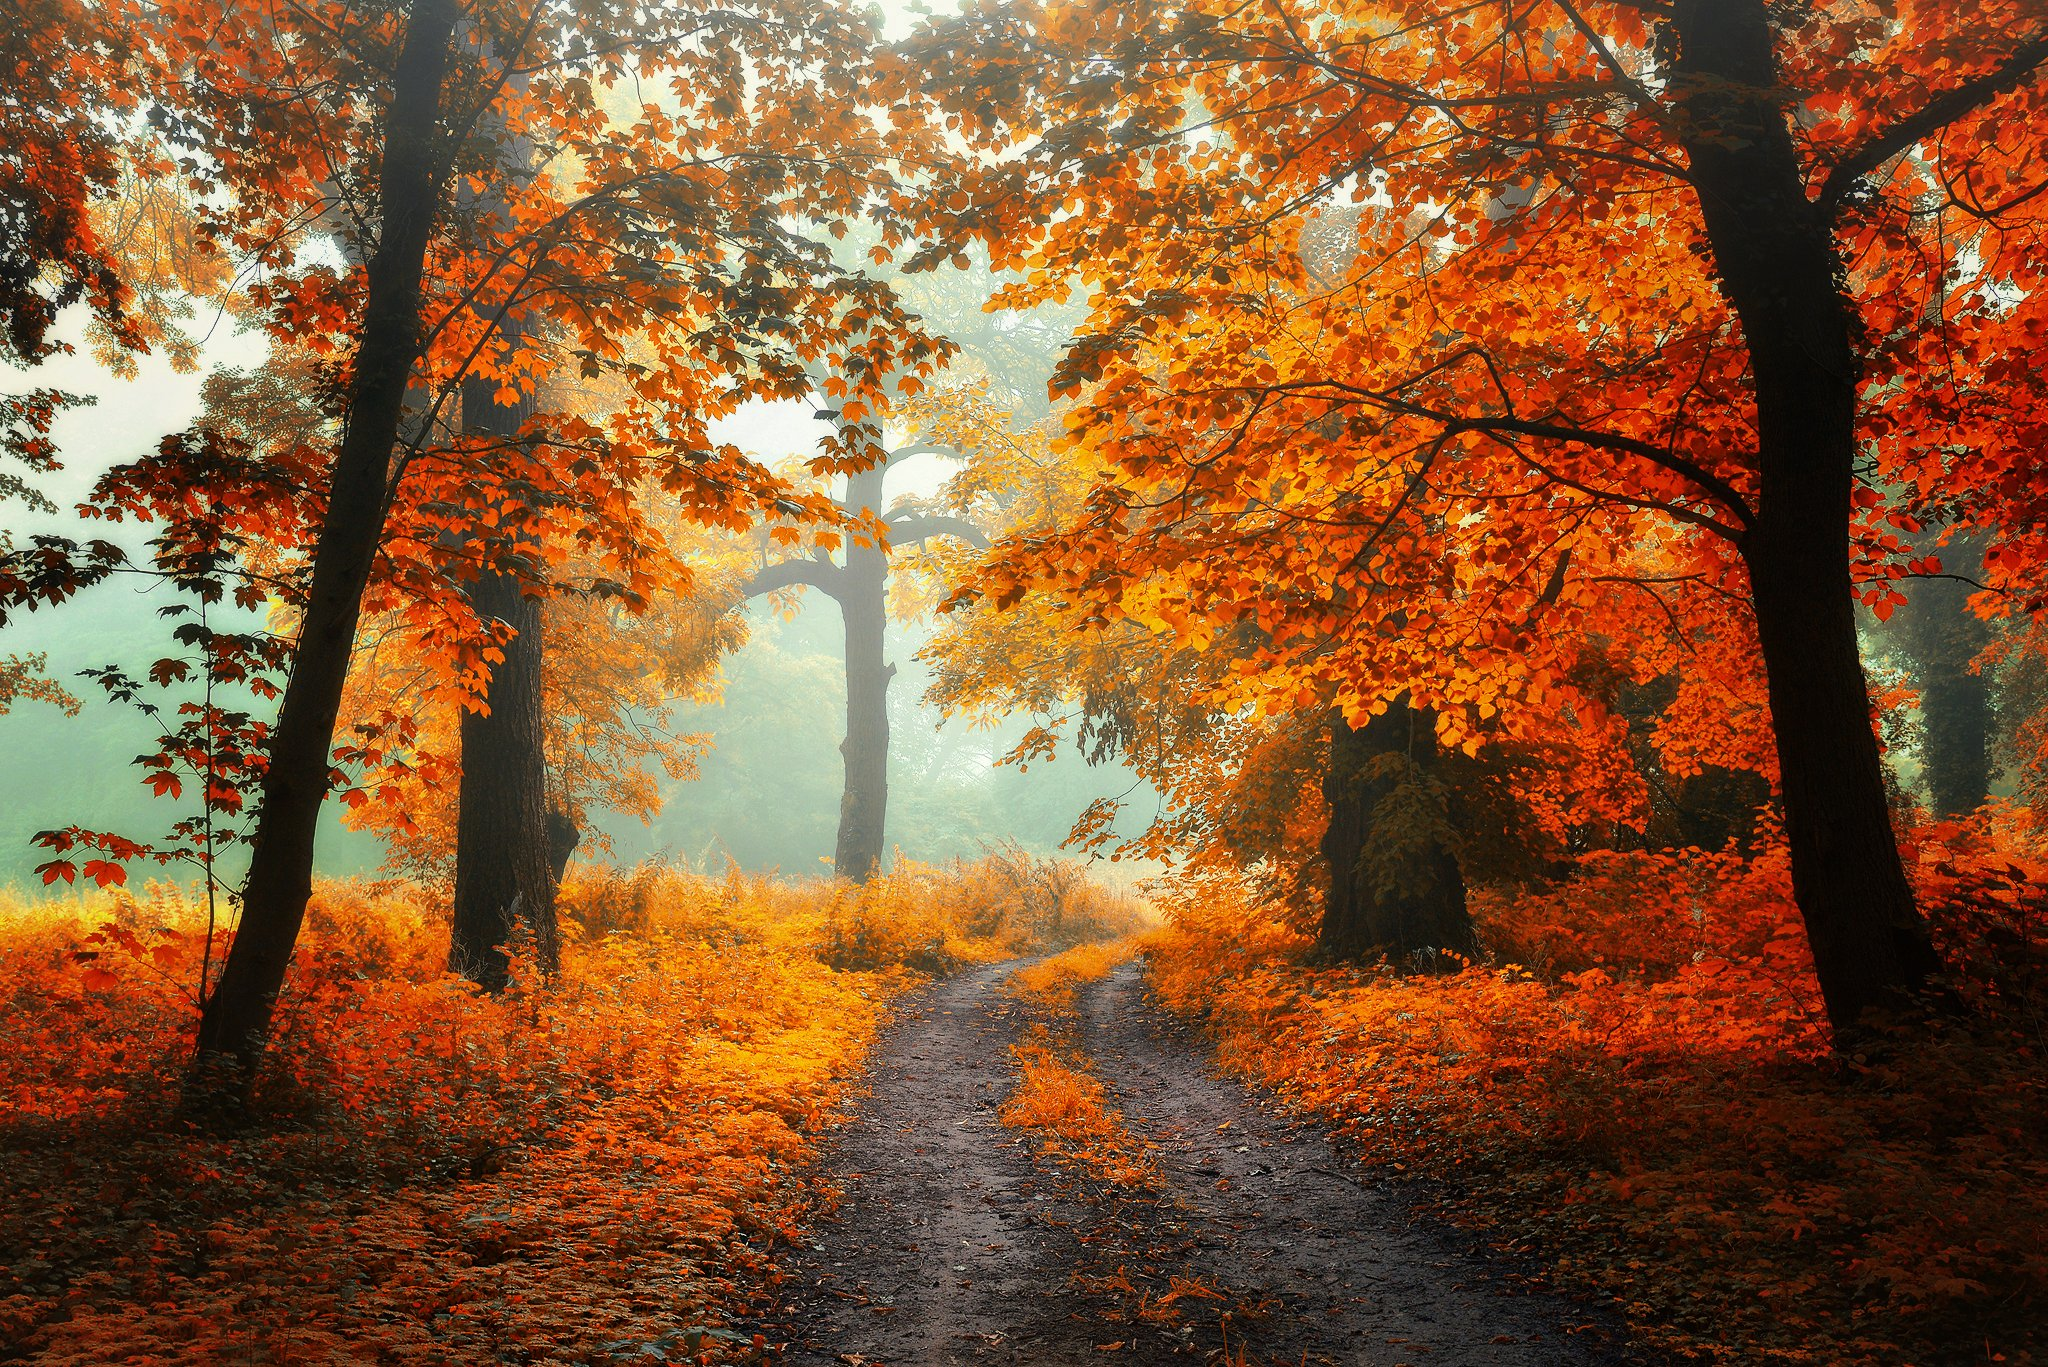 Oсенние цвета Radoslaw Dranikowski